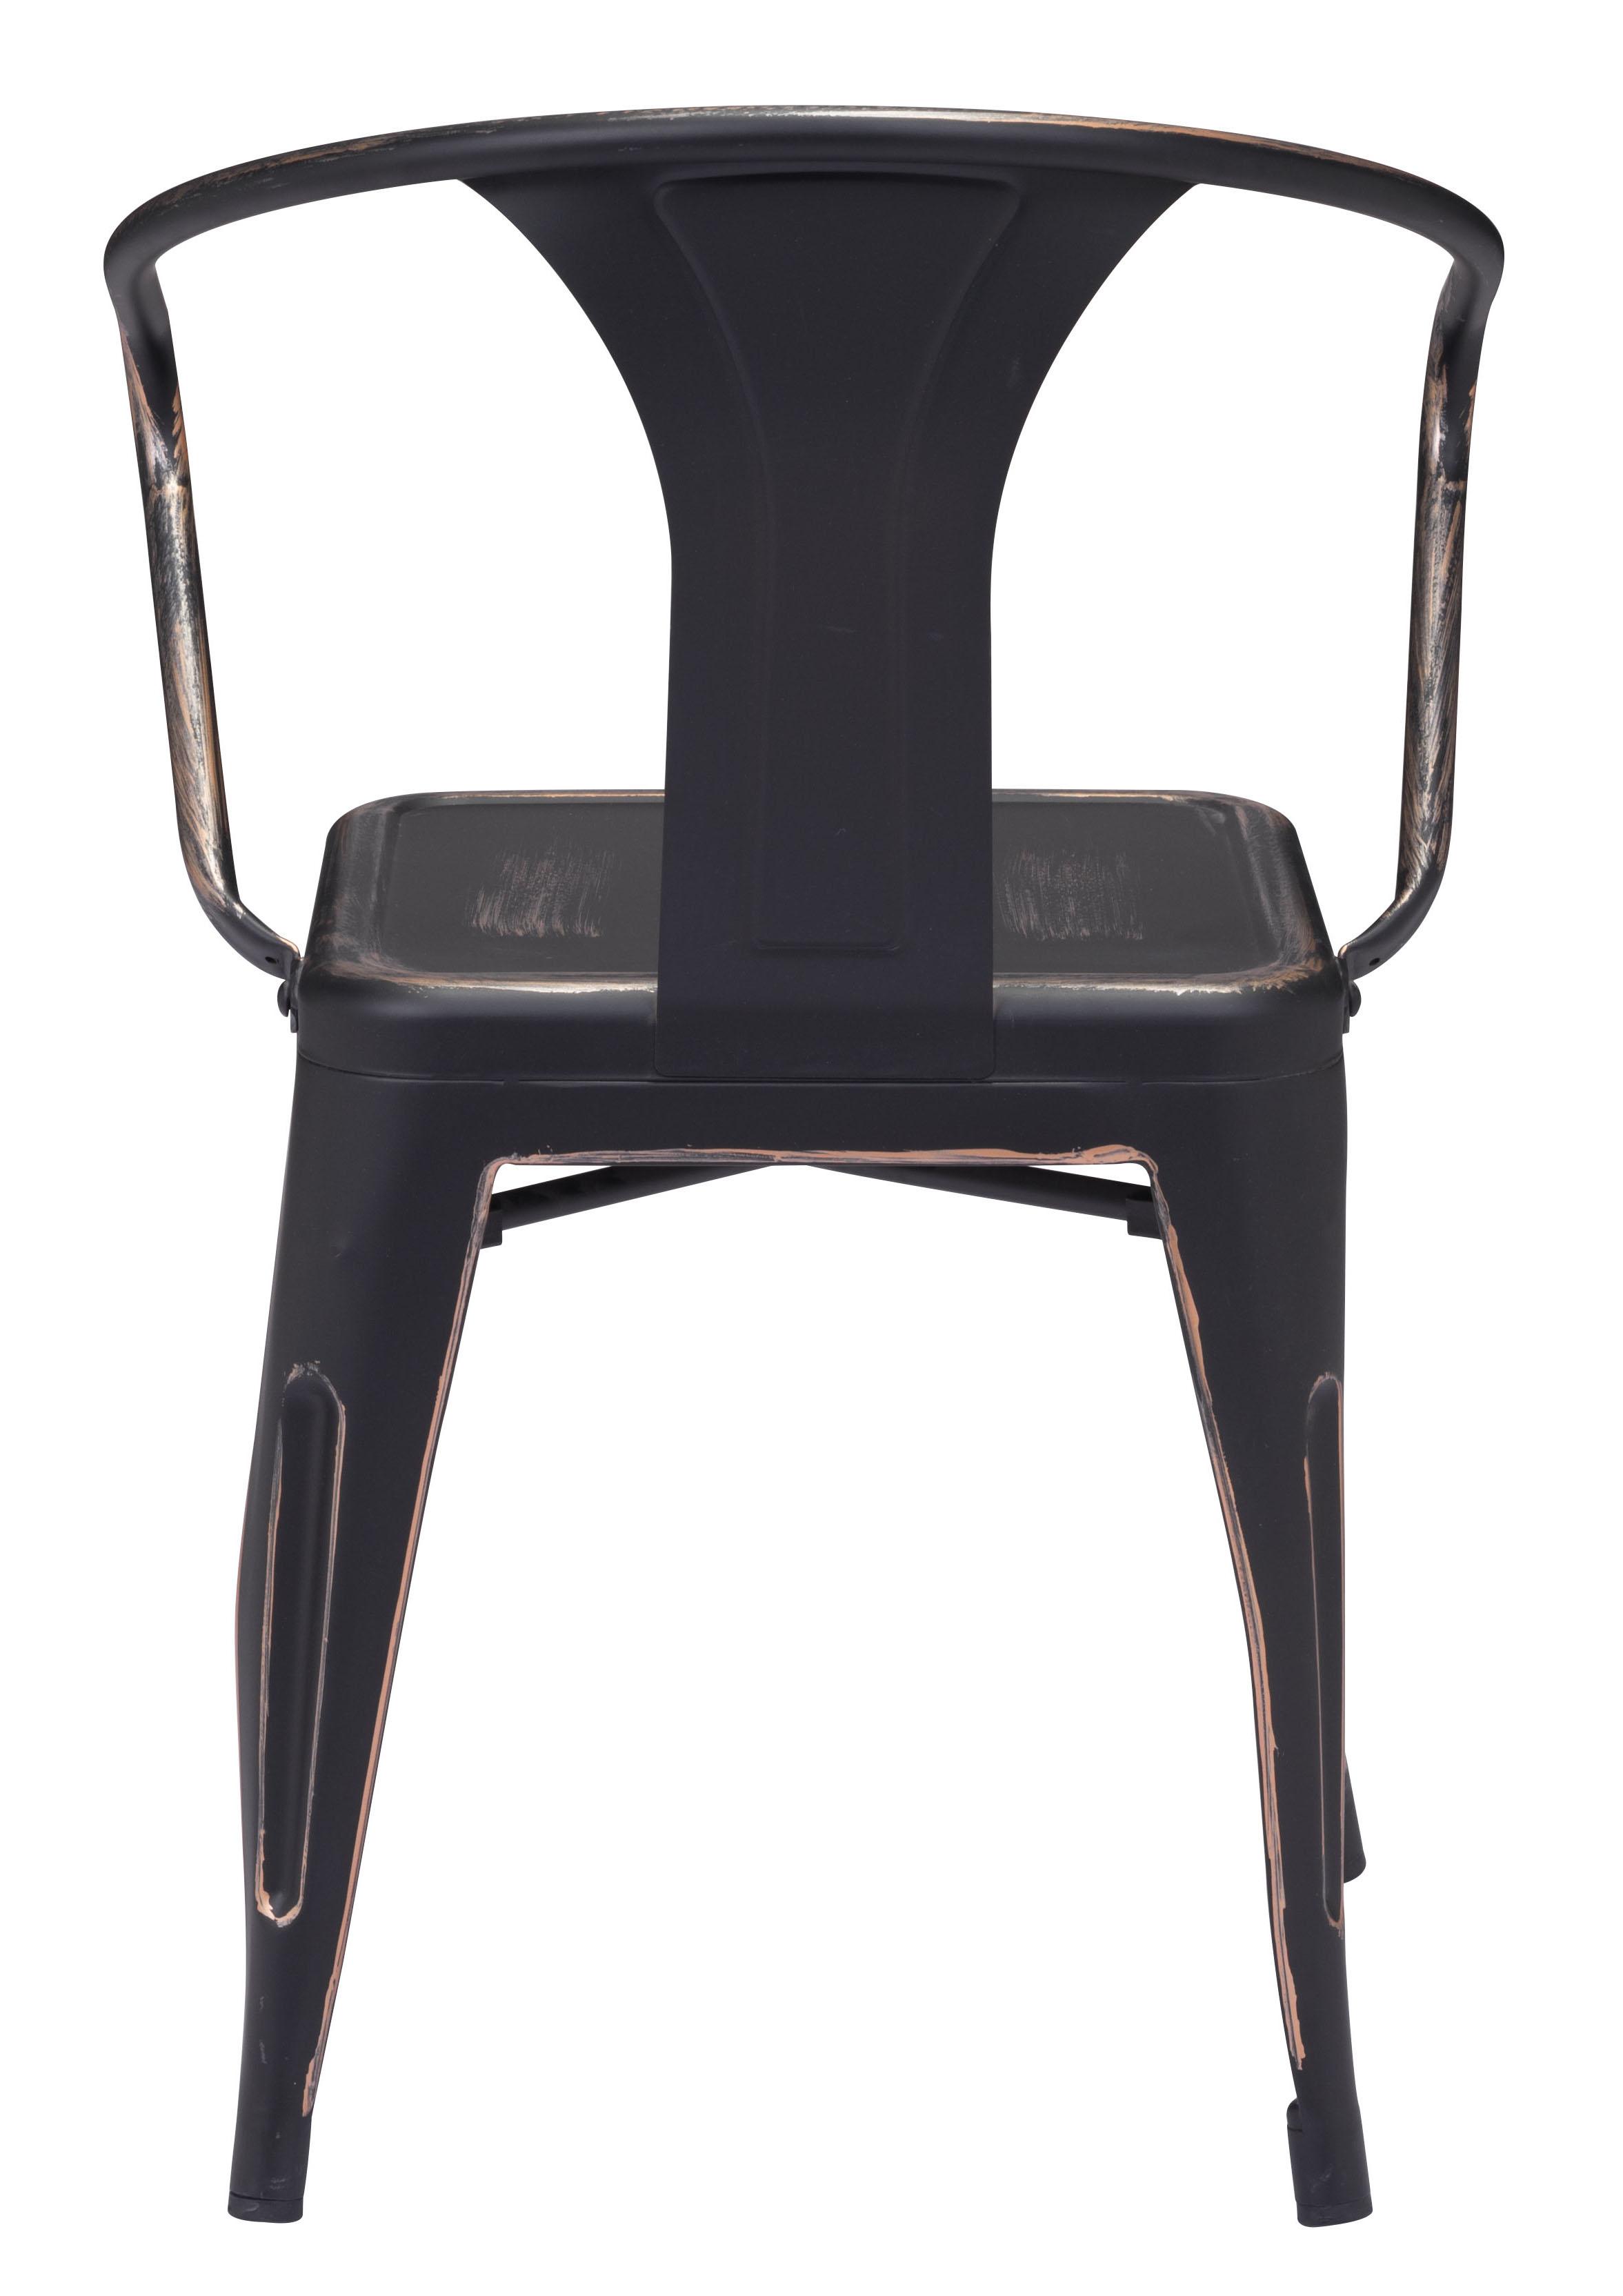 helix-chair-antique-black.jpg